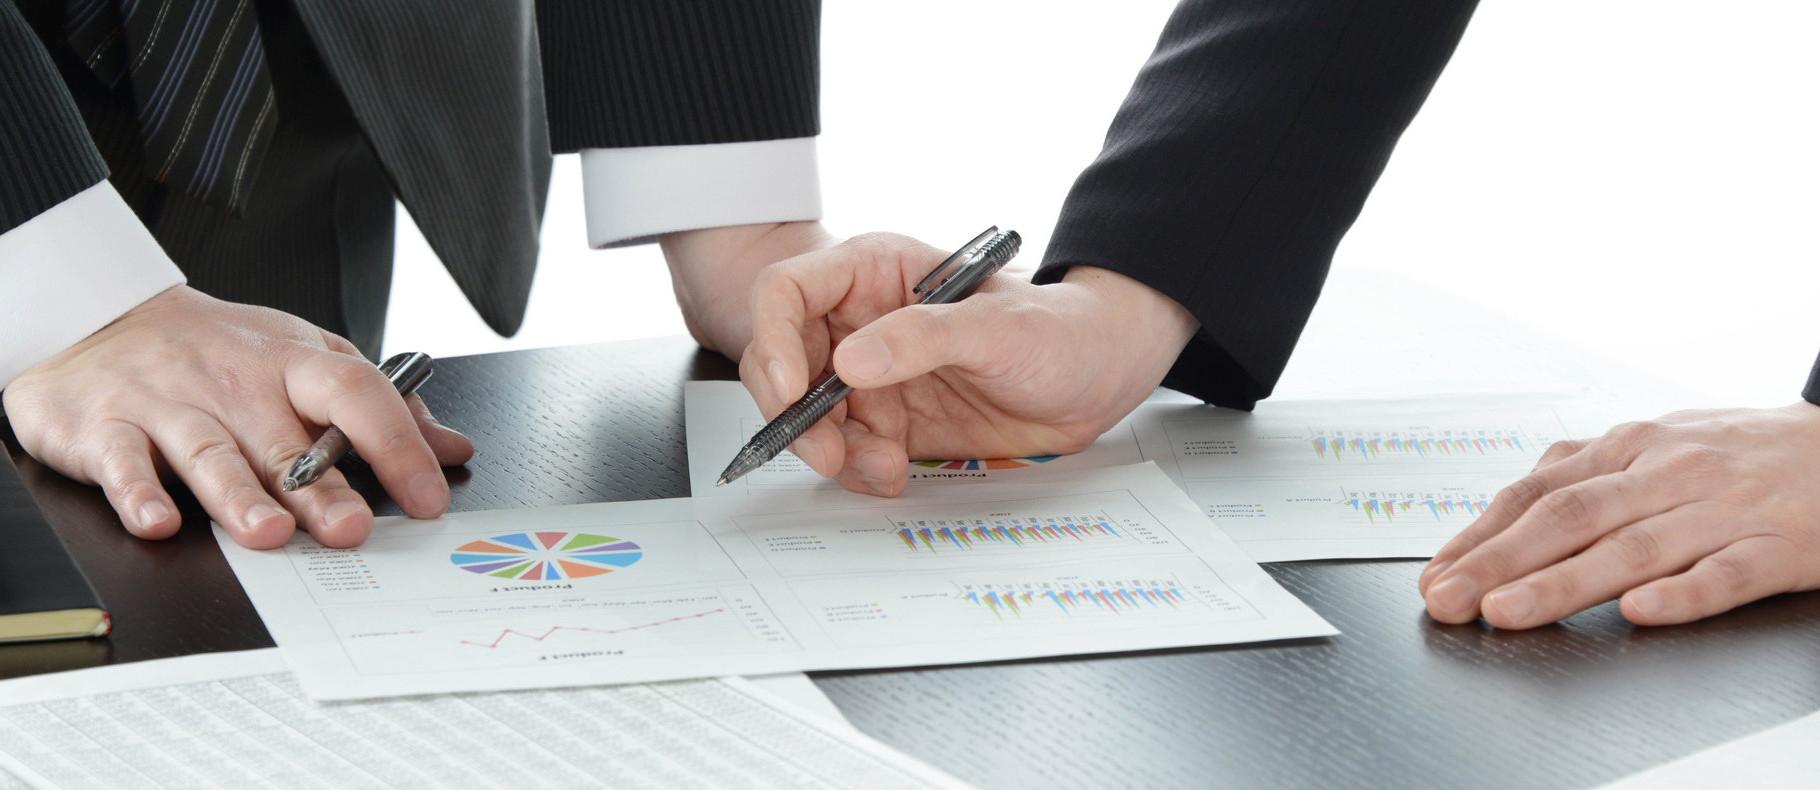 Making marketing measurable and accountable